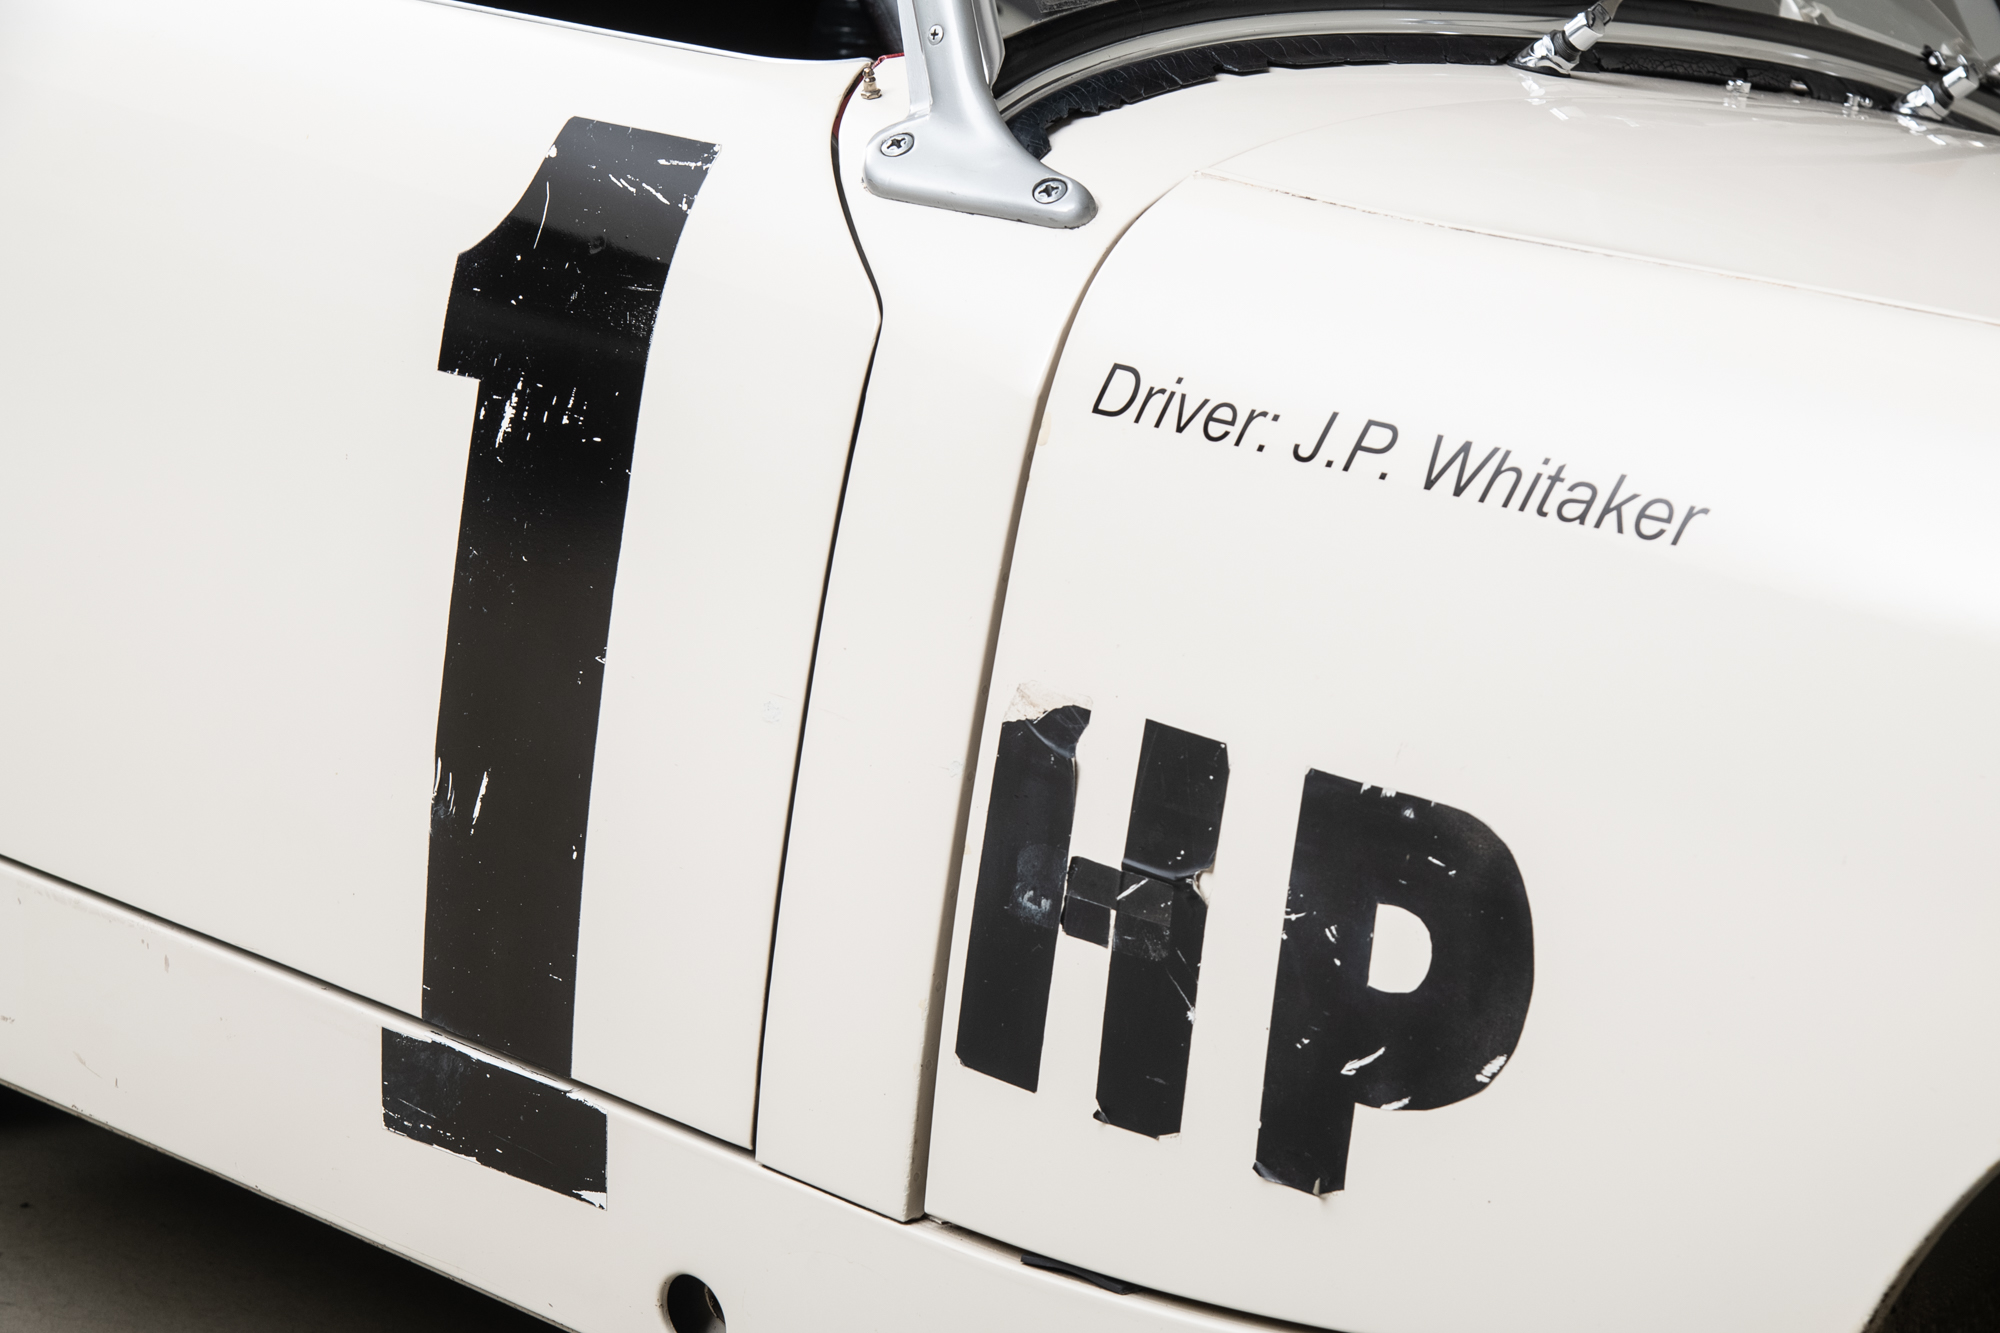 1959 Austin-Healey Sprite , WHITE, VIN AN5L9010, MILEAGE 19501